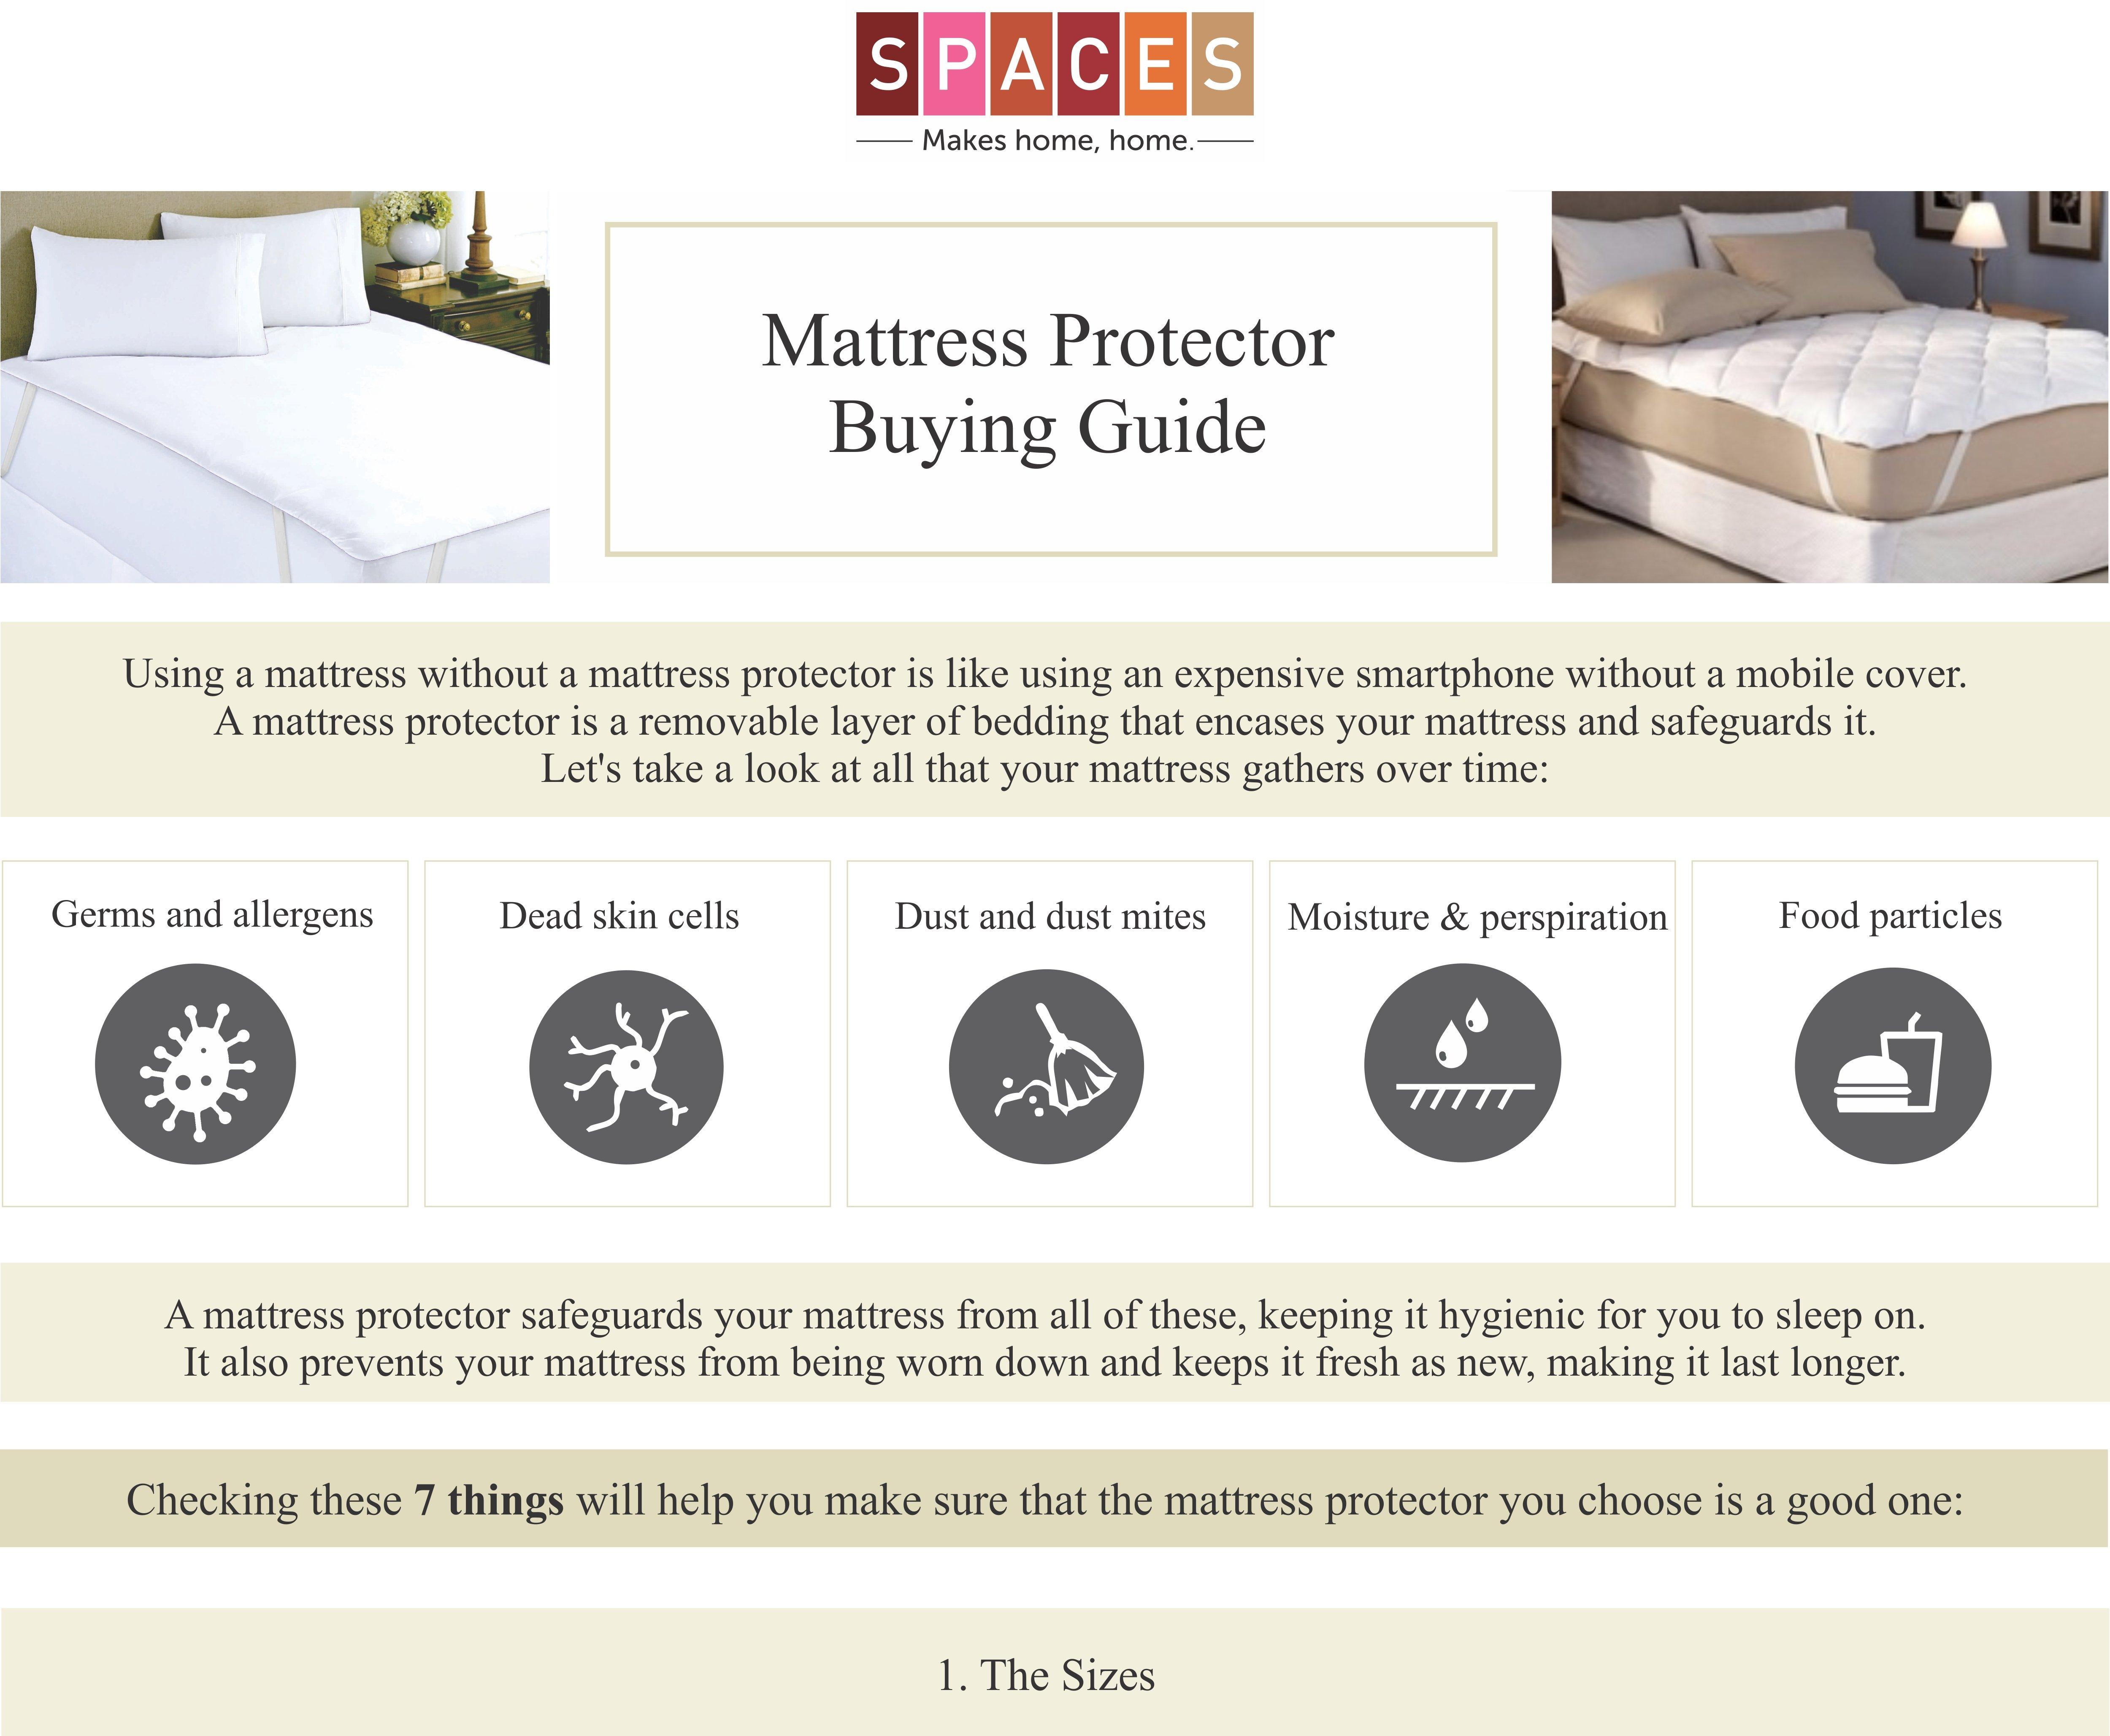 Mattress protectors buying guide